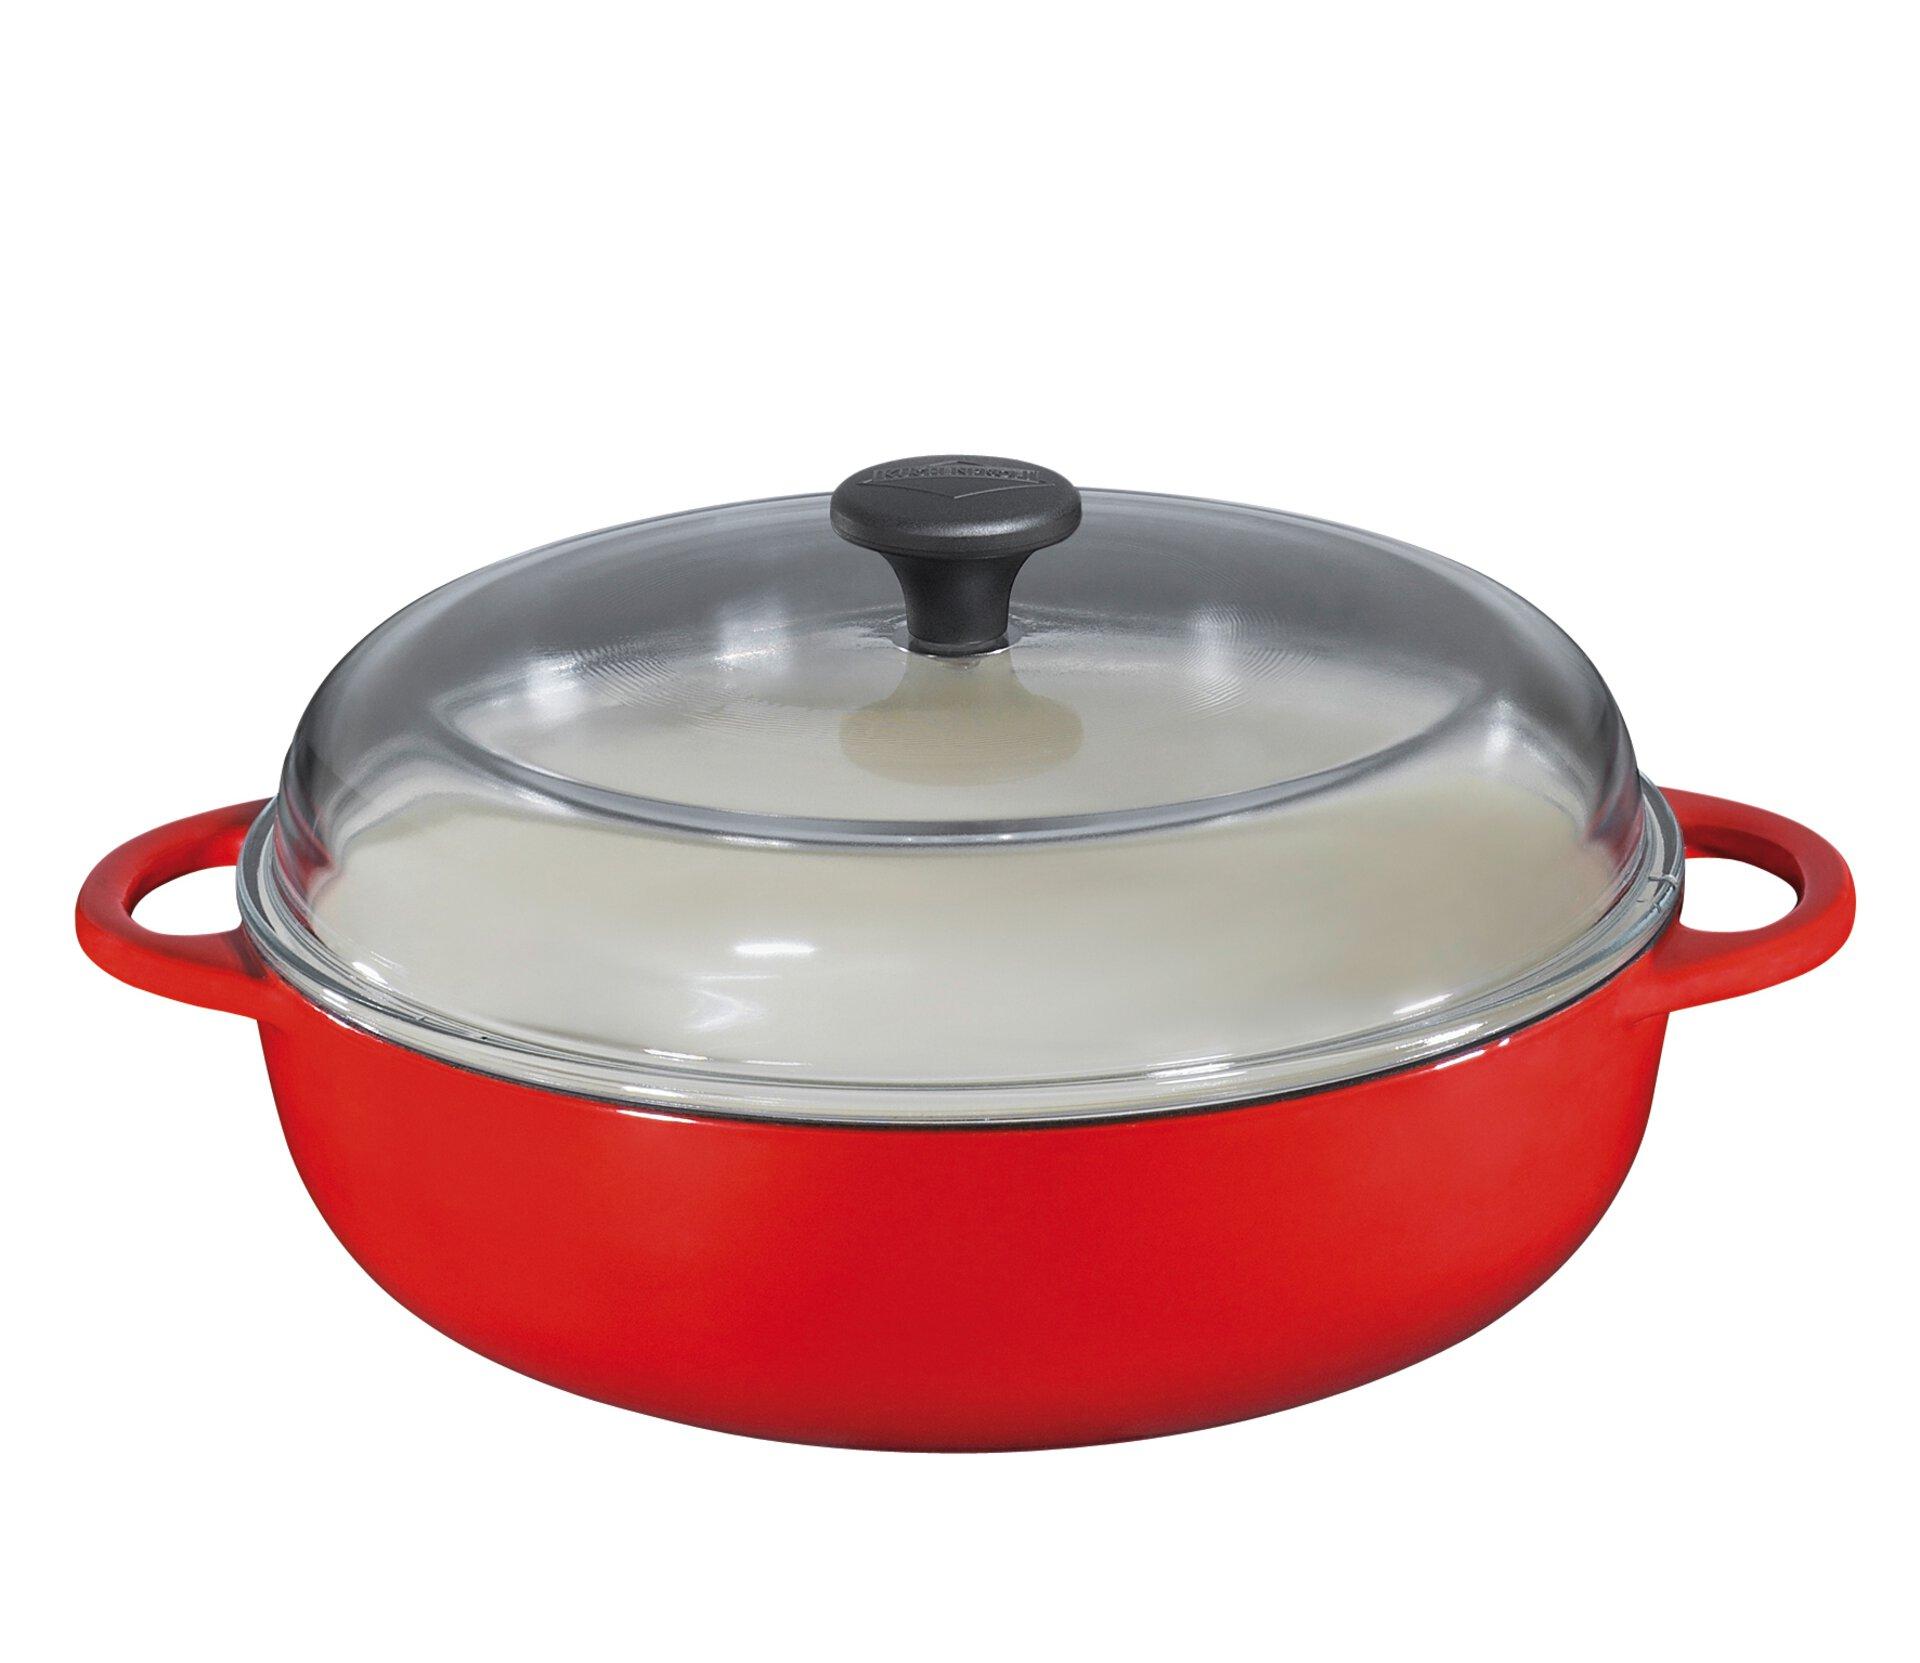 Pfanne PROVENCE Küchenprofi Metall 30 x 6 x